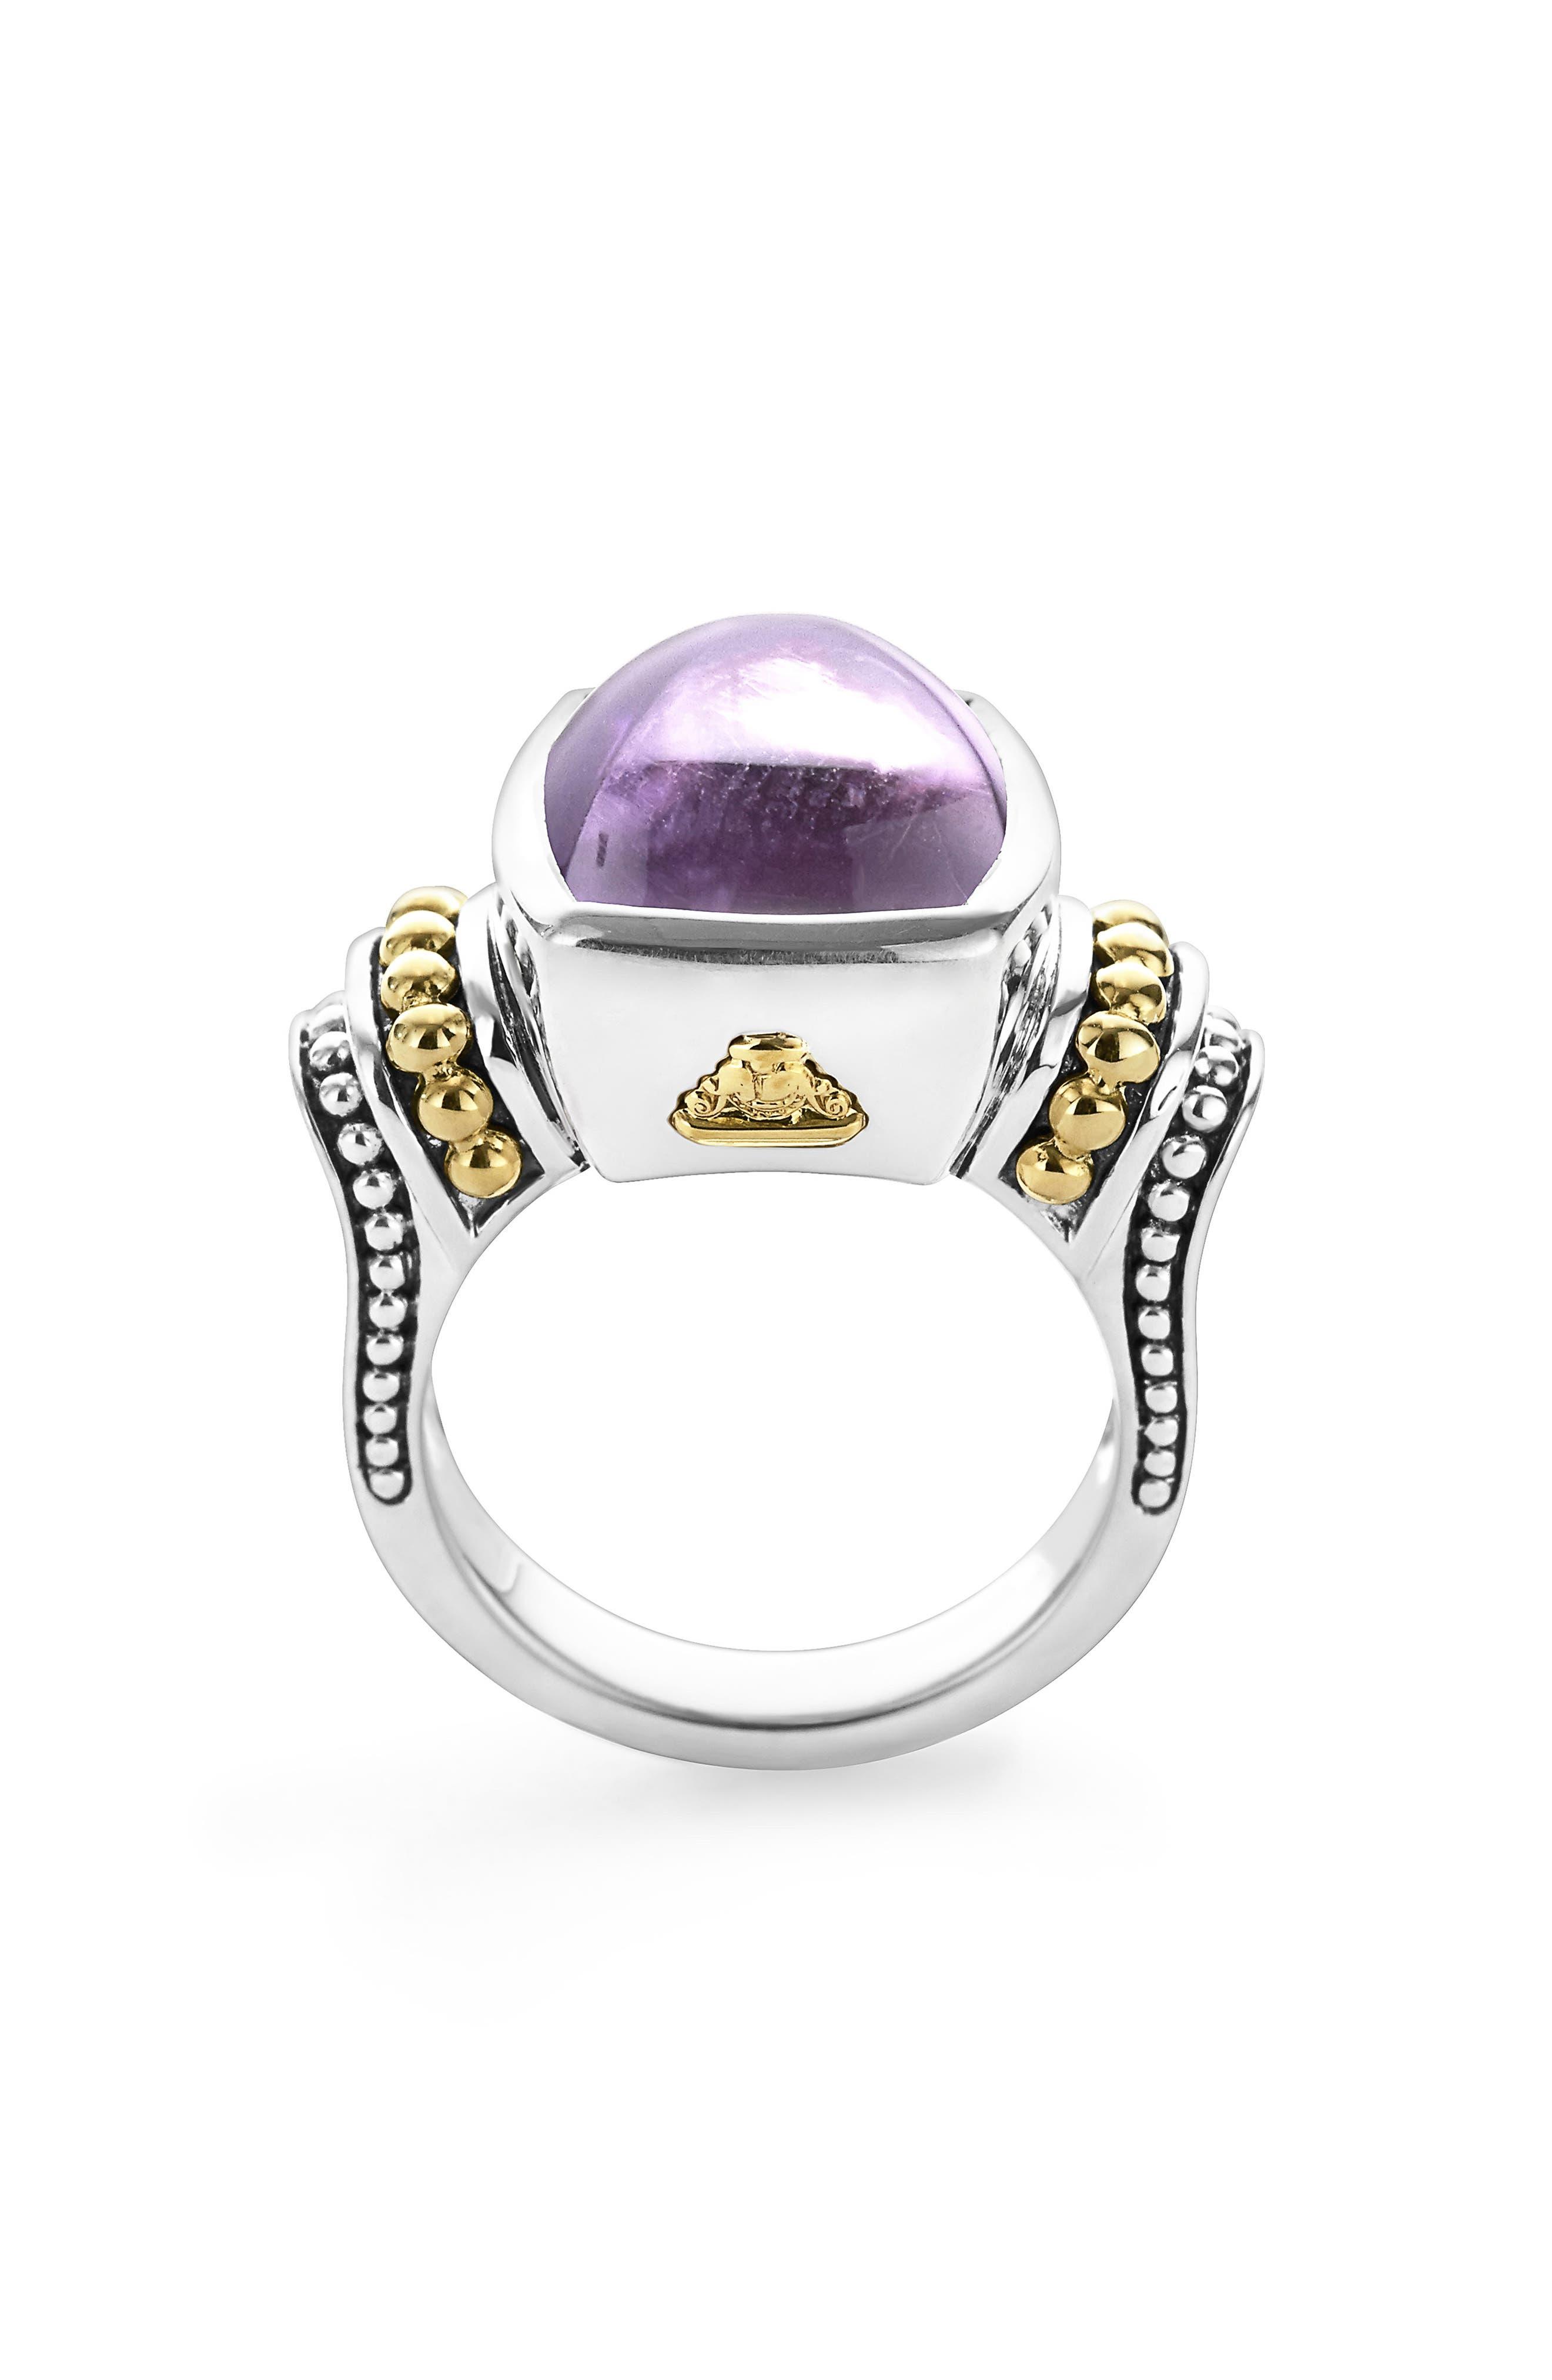 Women s 18K Gold Jewelry